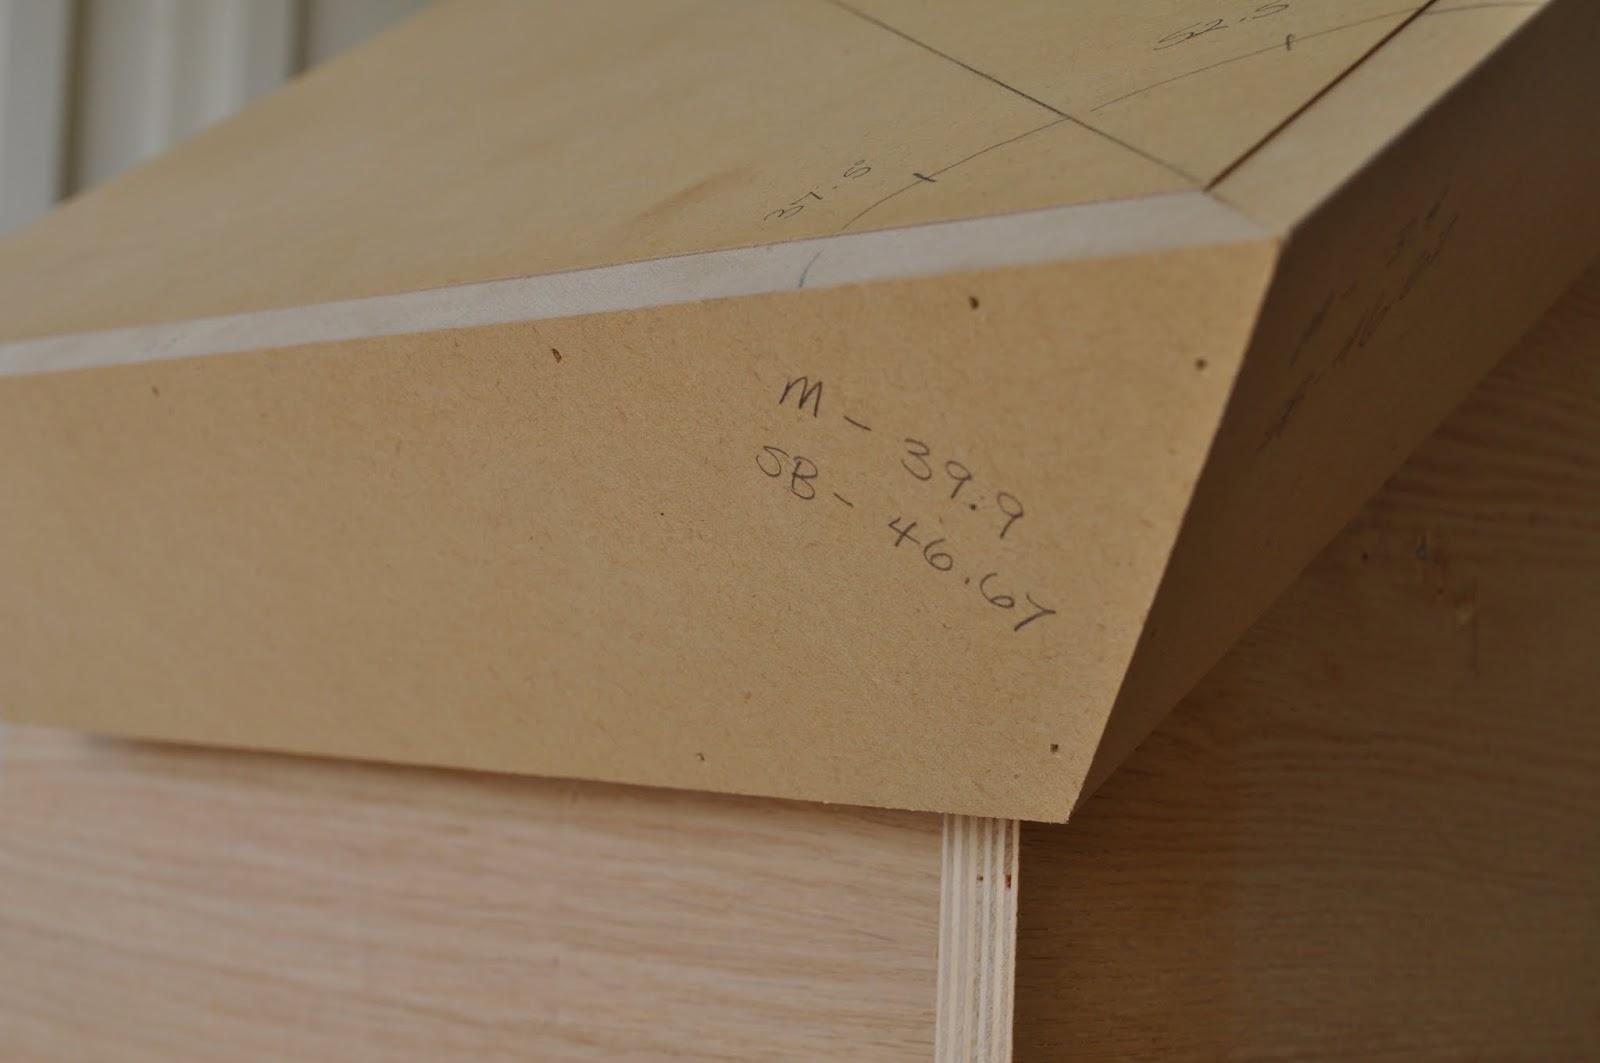 Roof Framing Geometry Exterior Rake Crown Moulding Angles Jig